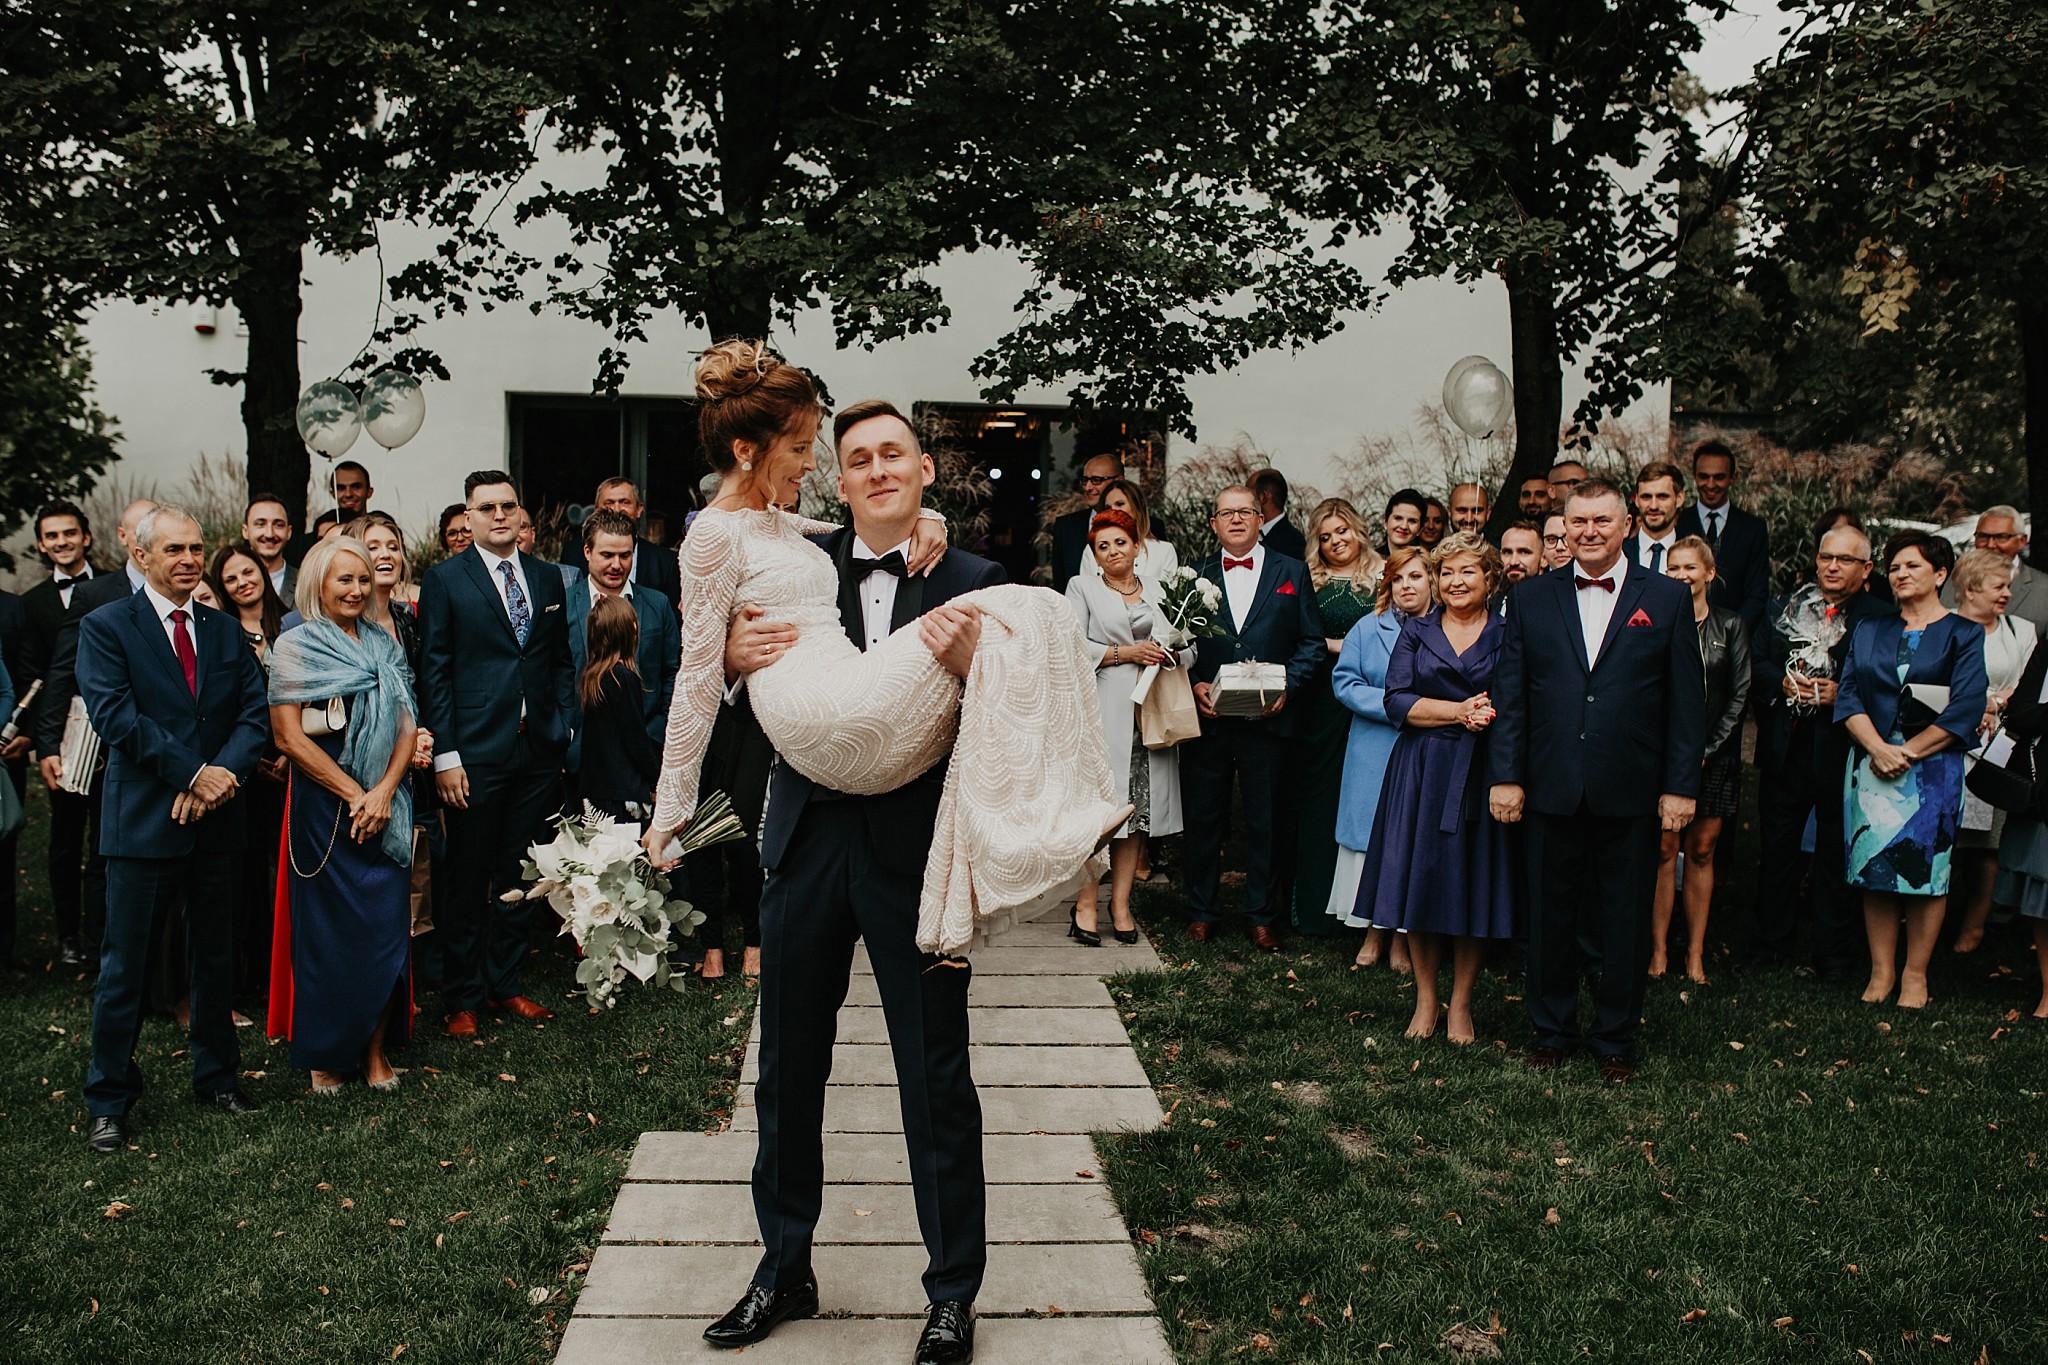 fotograf poznan wesele dobra truskawka piekne wesele pod poznaniem wesele w dobrej truskawce piekna para mloda slub marzen slub koronawirus slub listopad wesele koronawirus 265